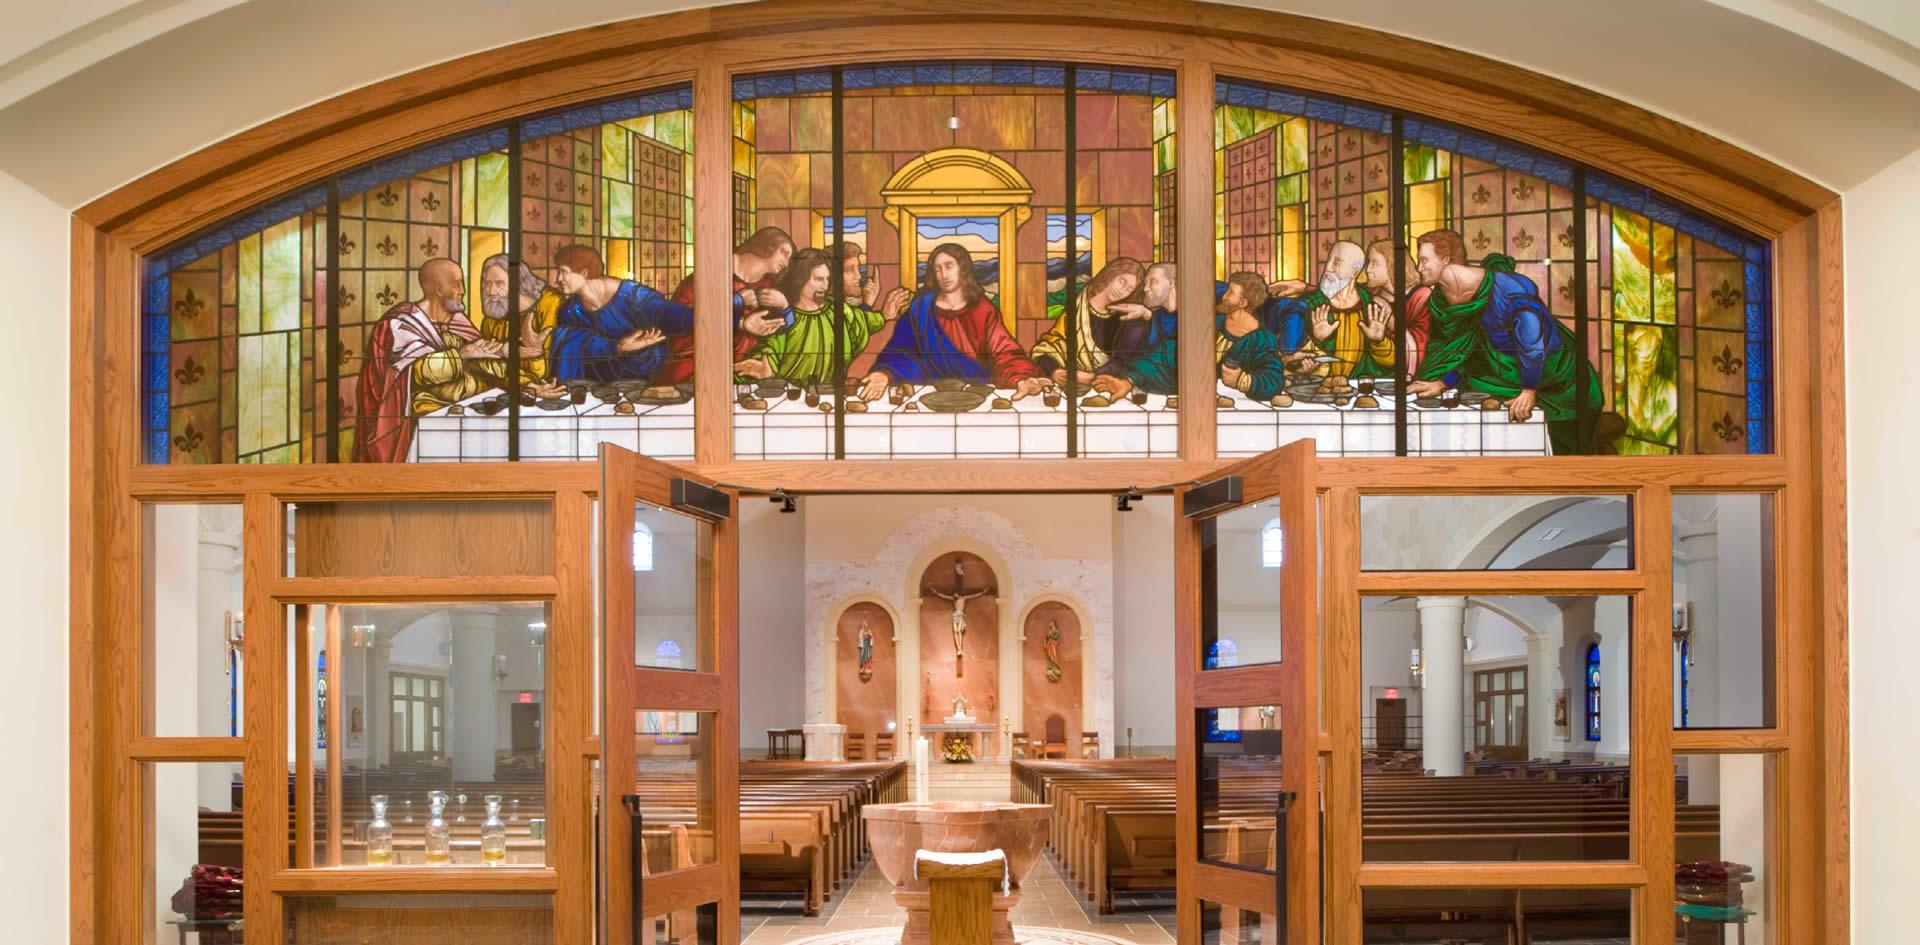 Jackson & Ryan Architects | Our Lady of Lourdes Catholic Church